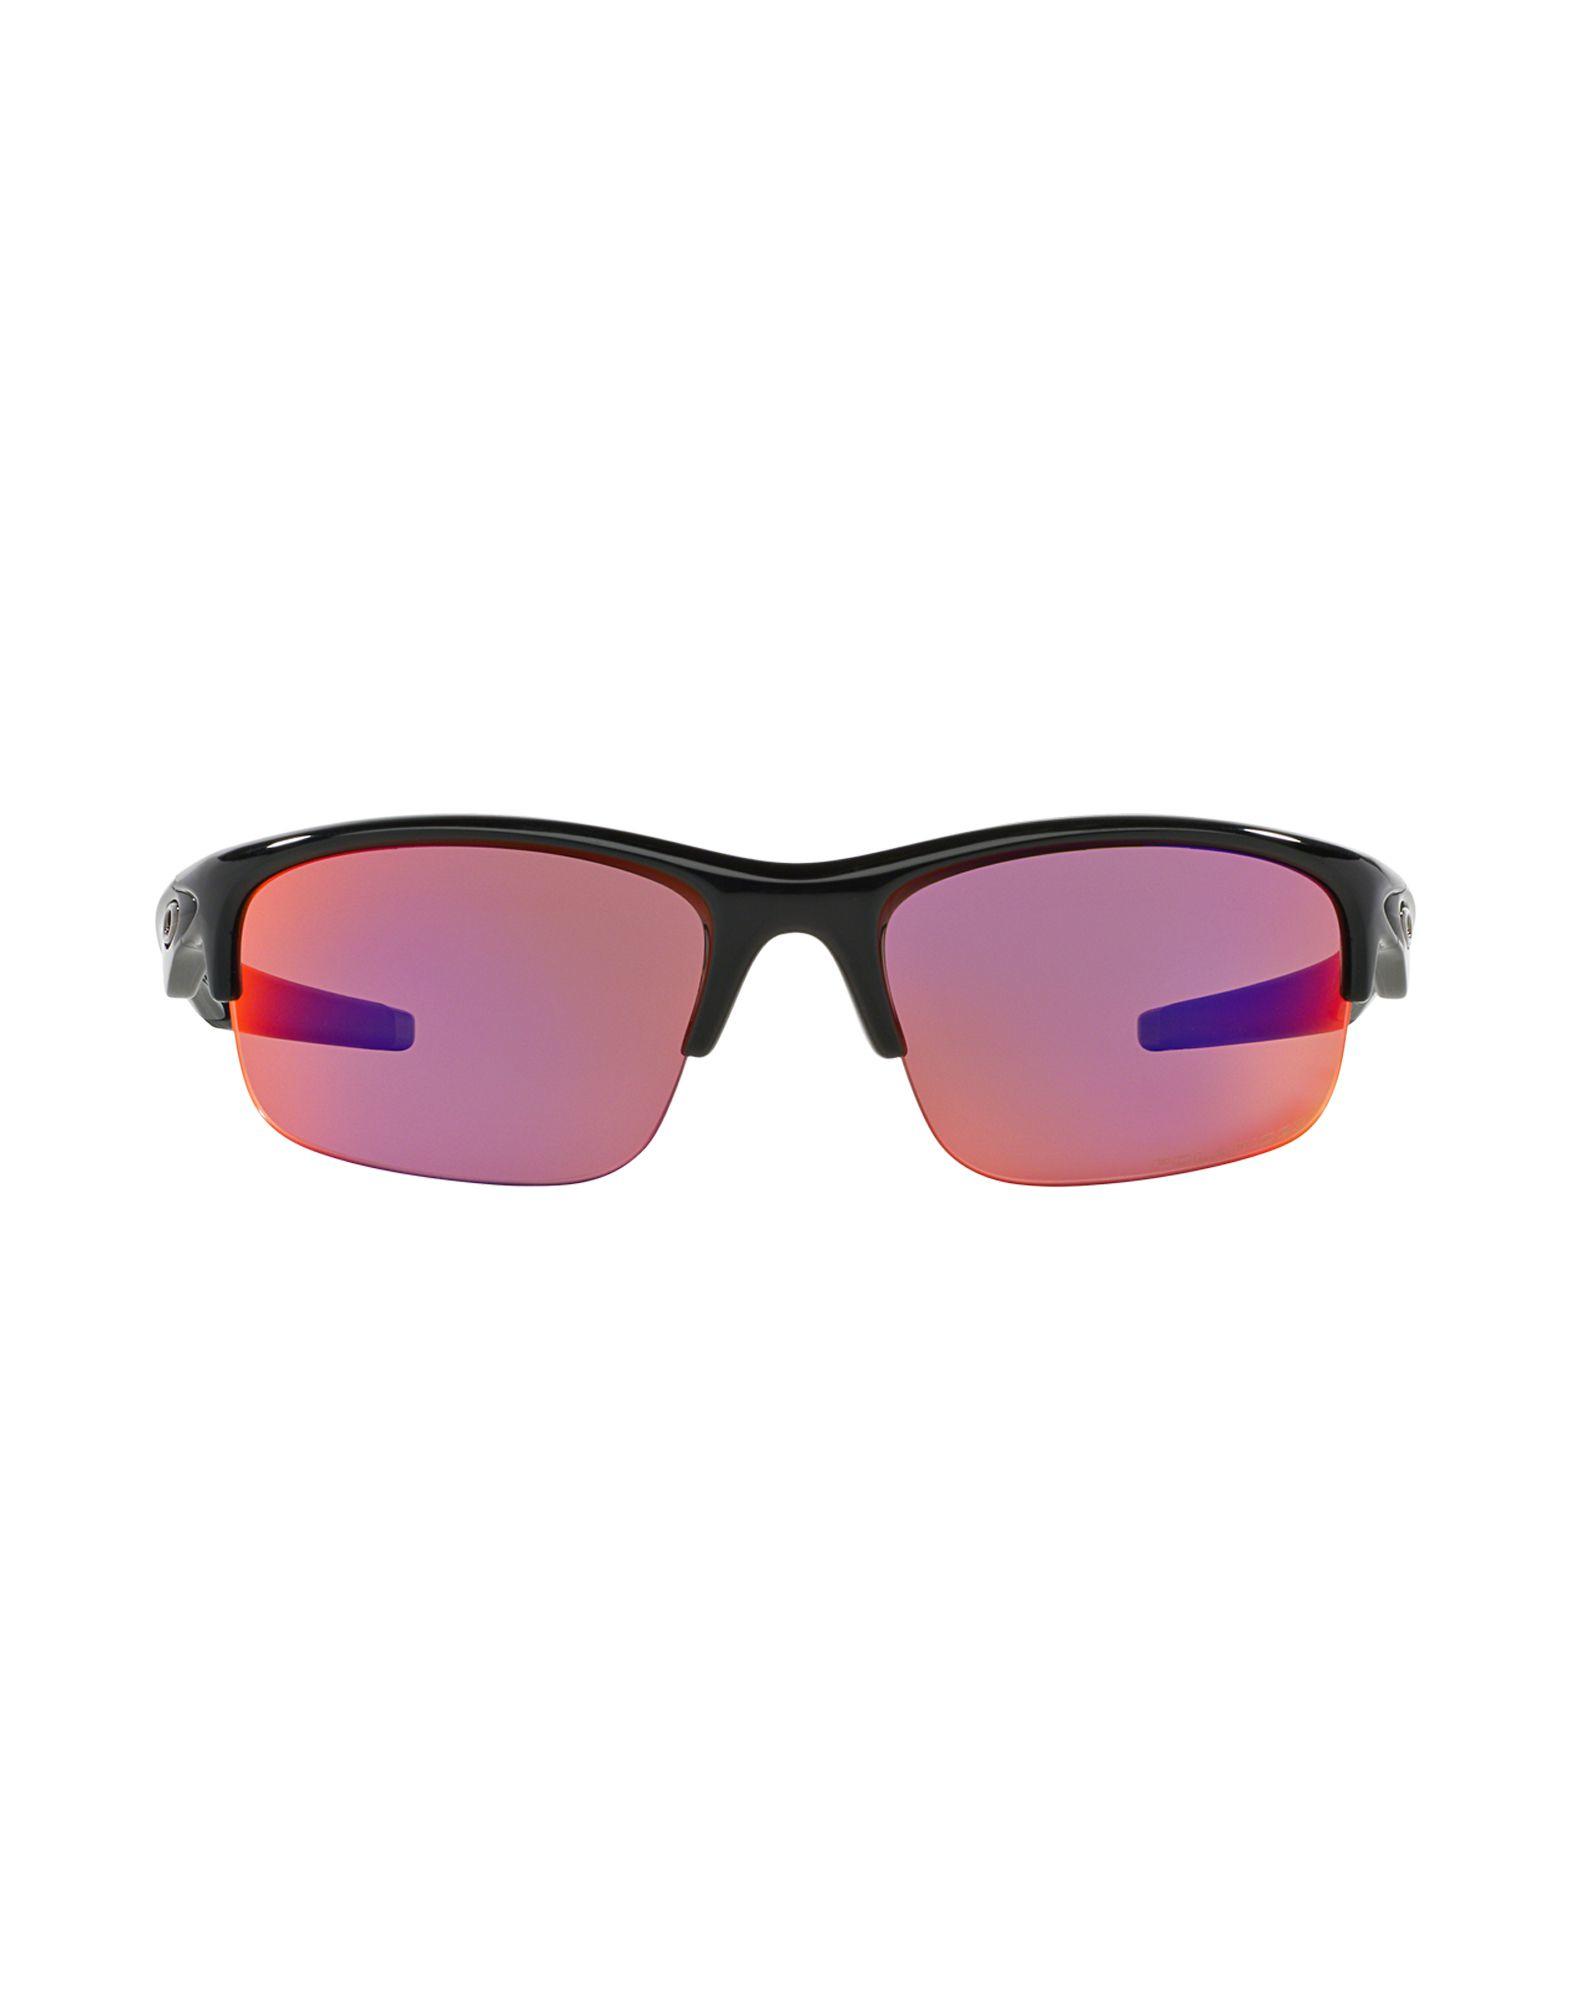 oakley sunglasses instagram